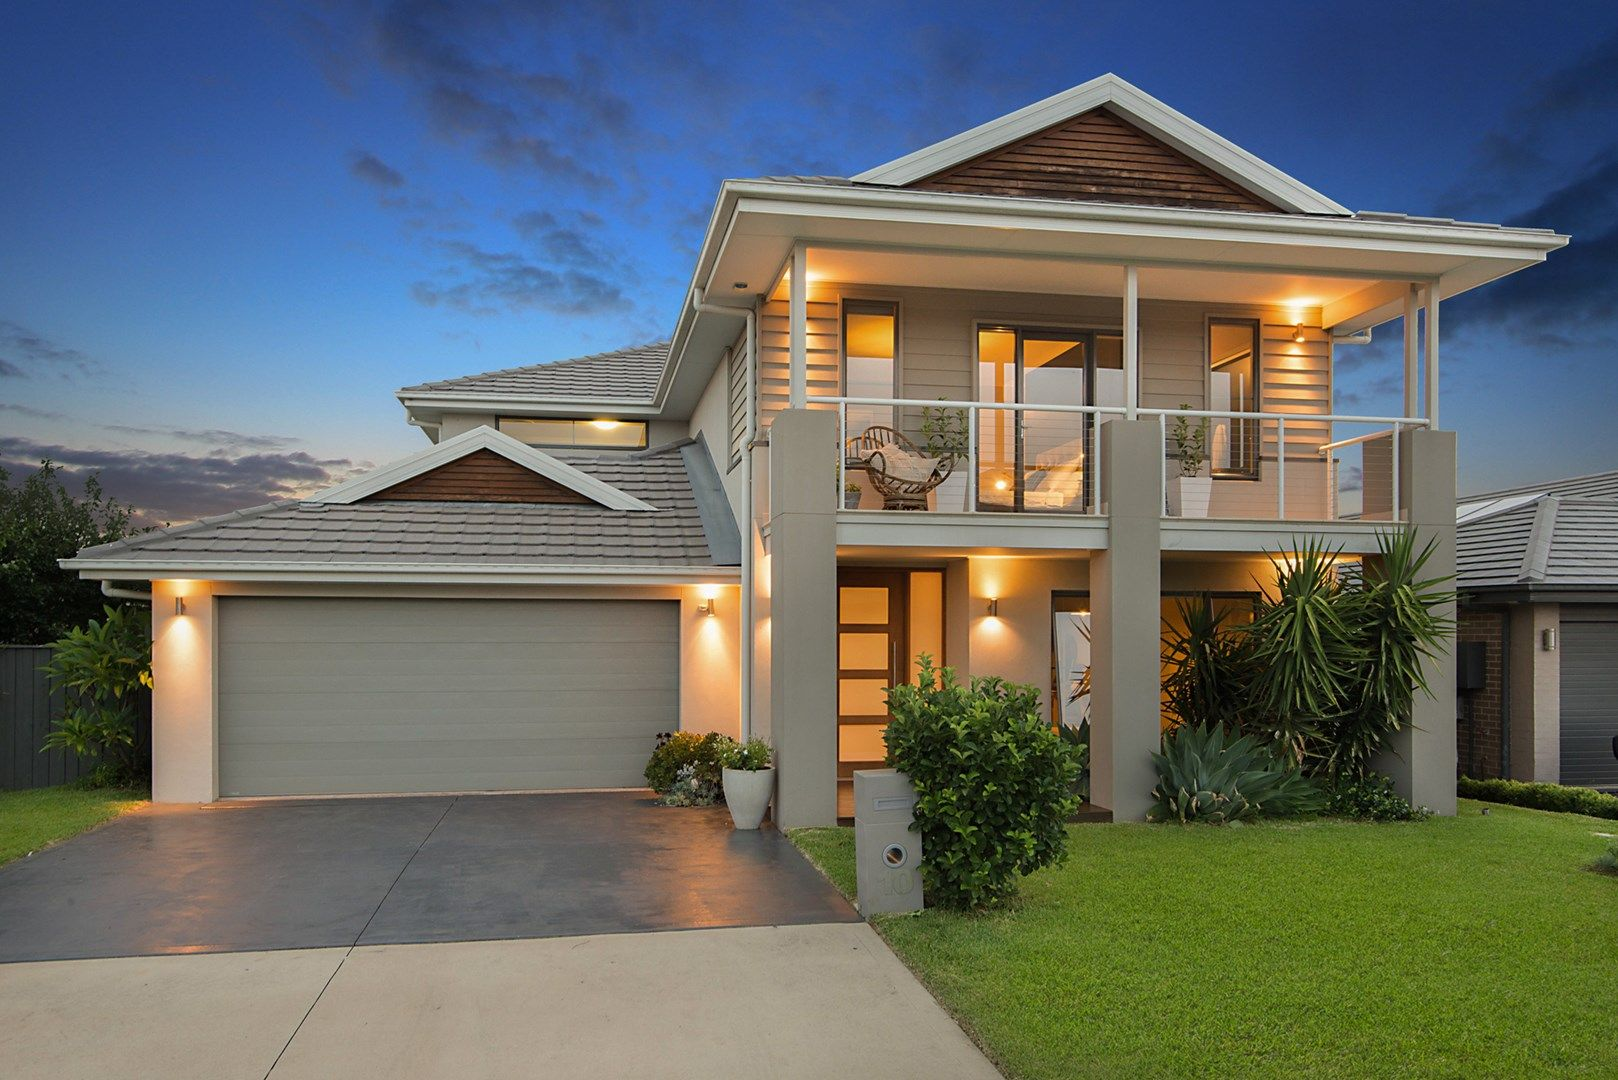 10 Savannah Street, Colebee NSW 2761, Image 0